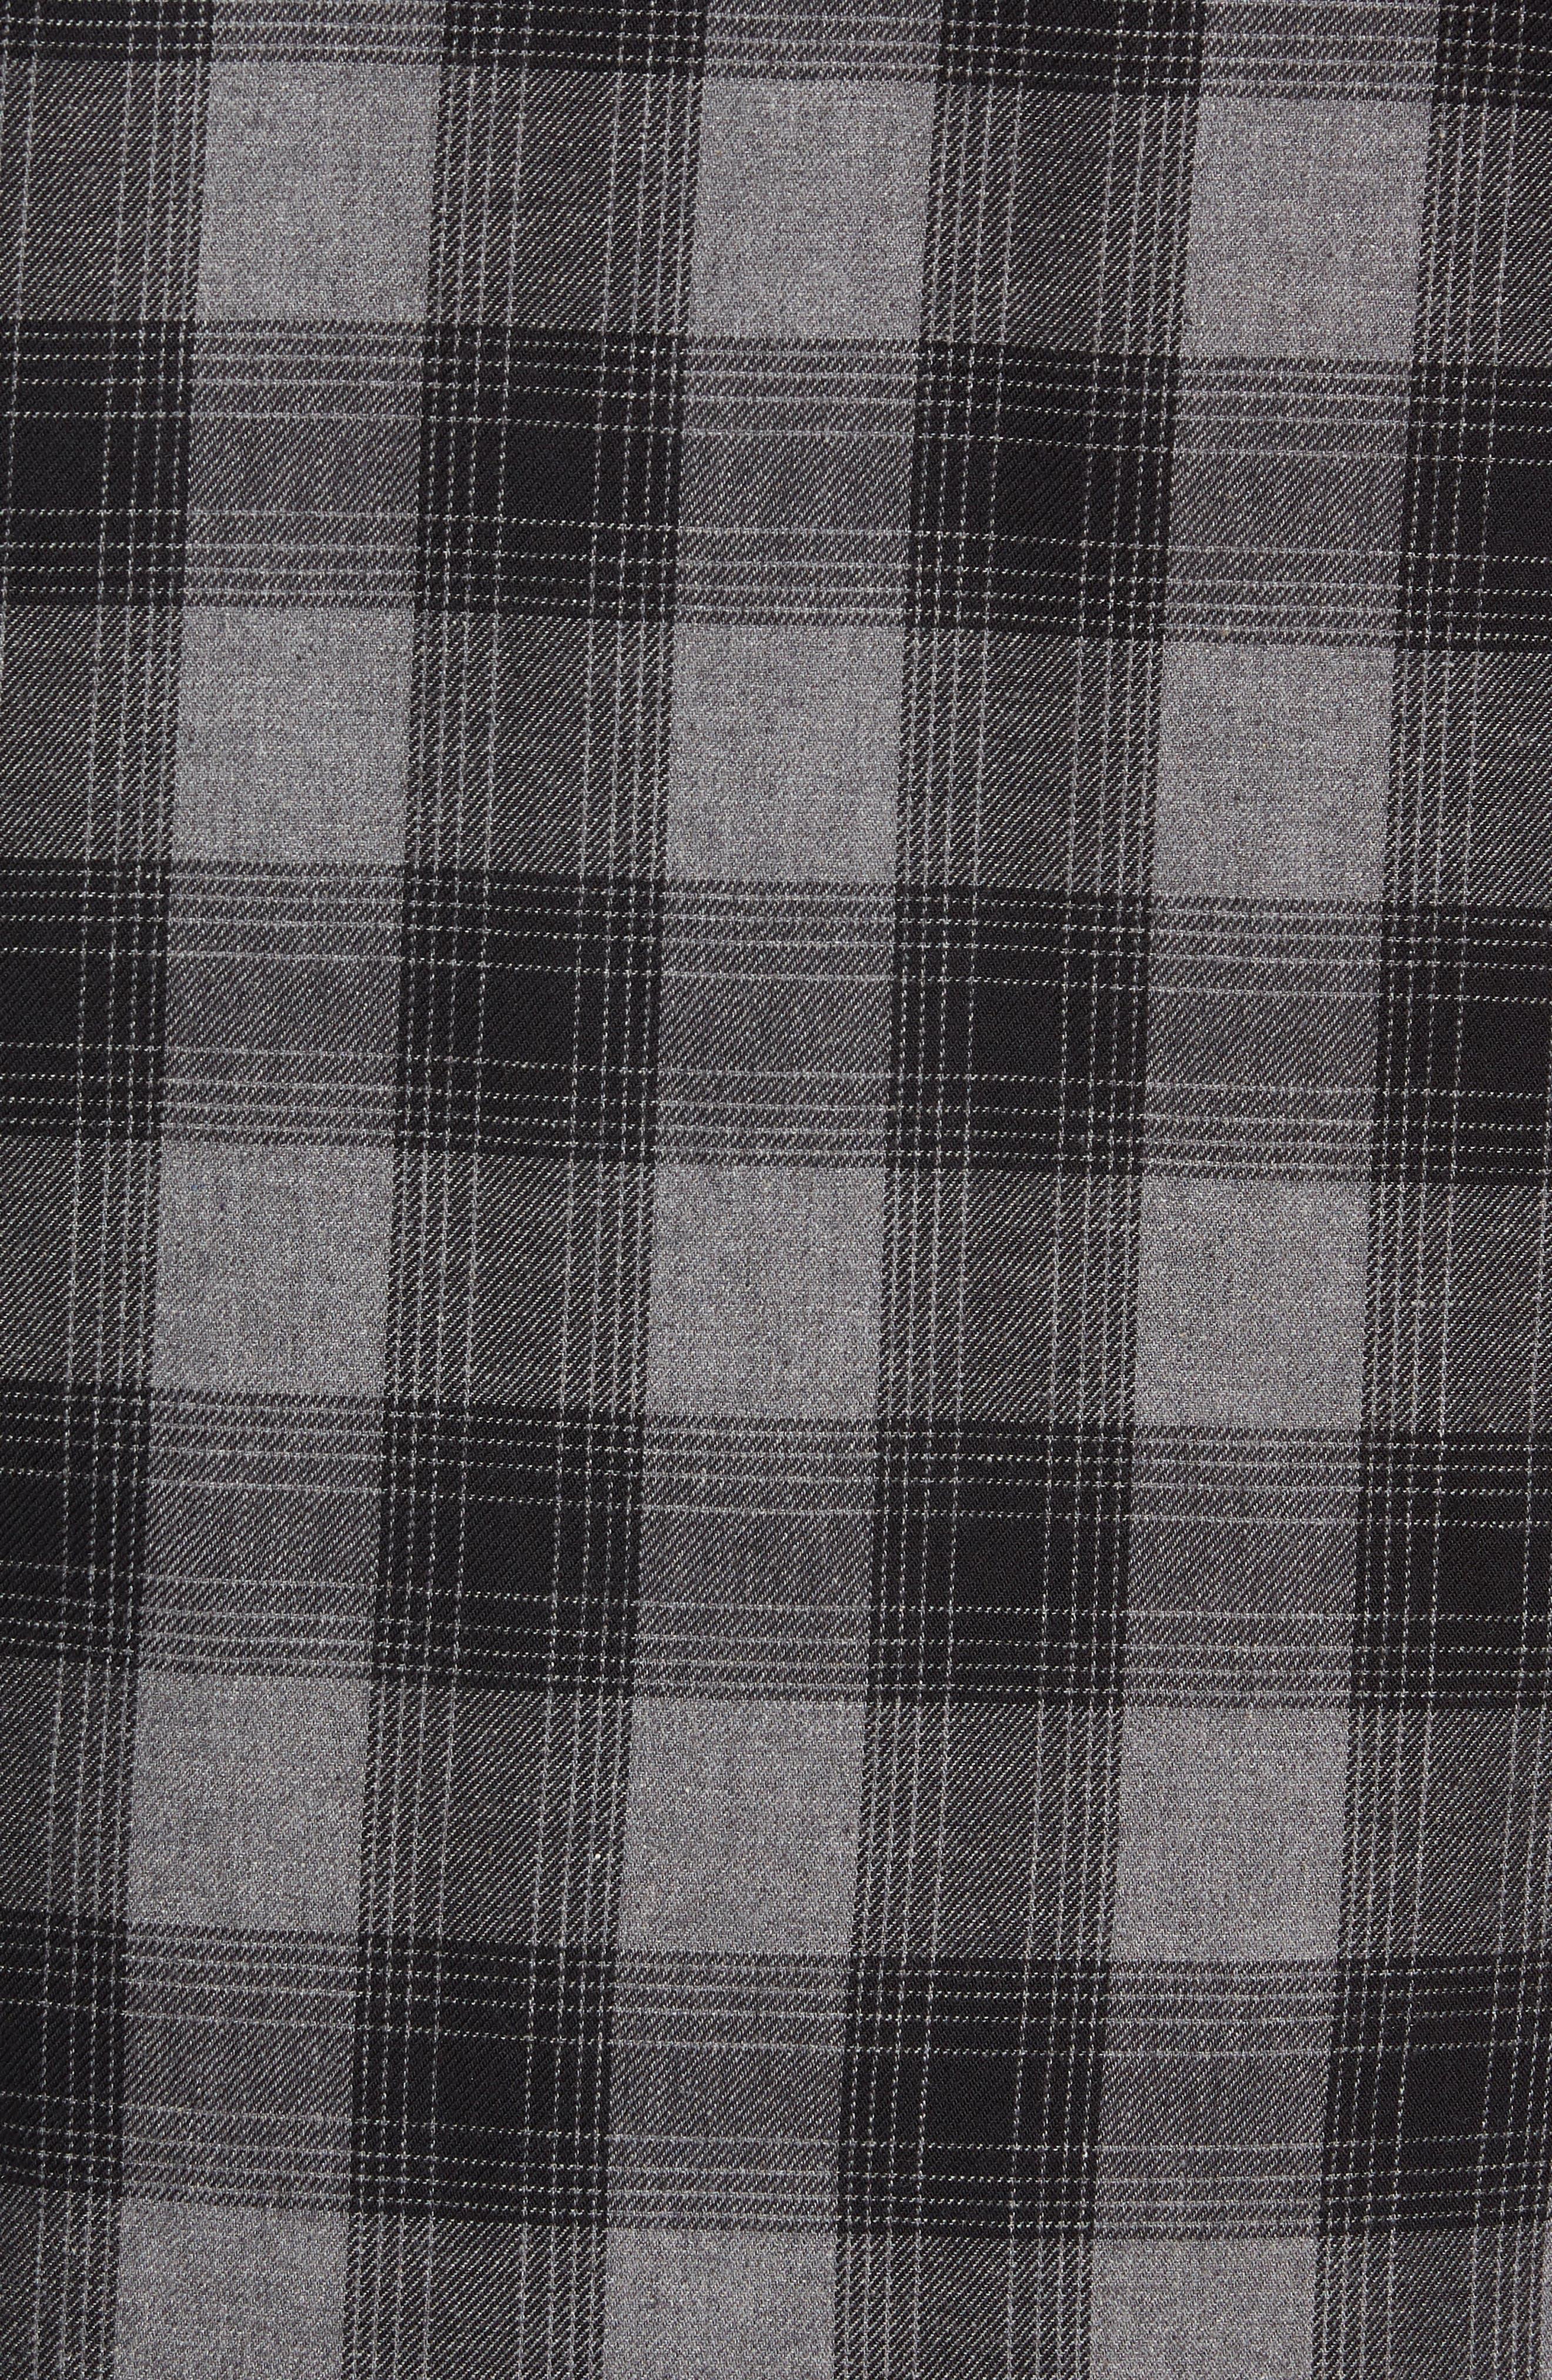 VANS,                             Parnell Plaid Shirt Jacket,                             Alternate thumbnail 7, color,                             GRAVEL HEATHER